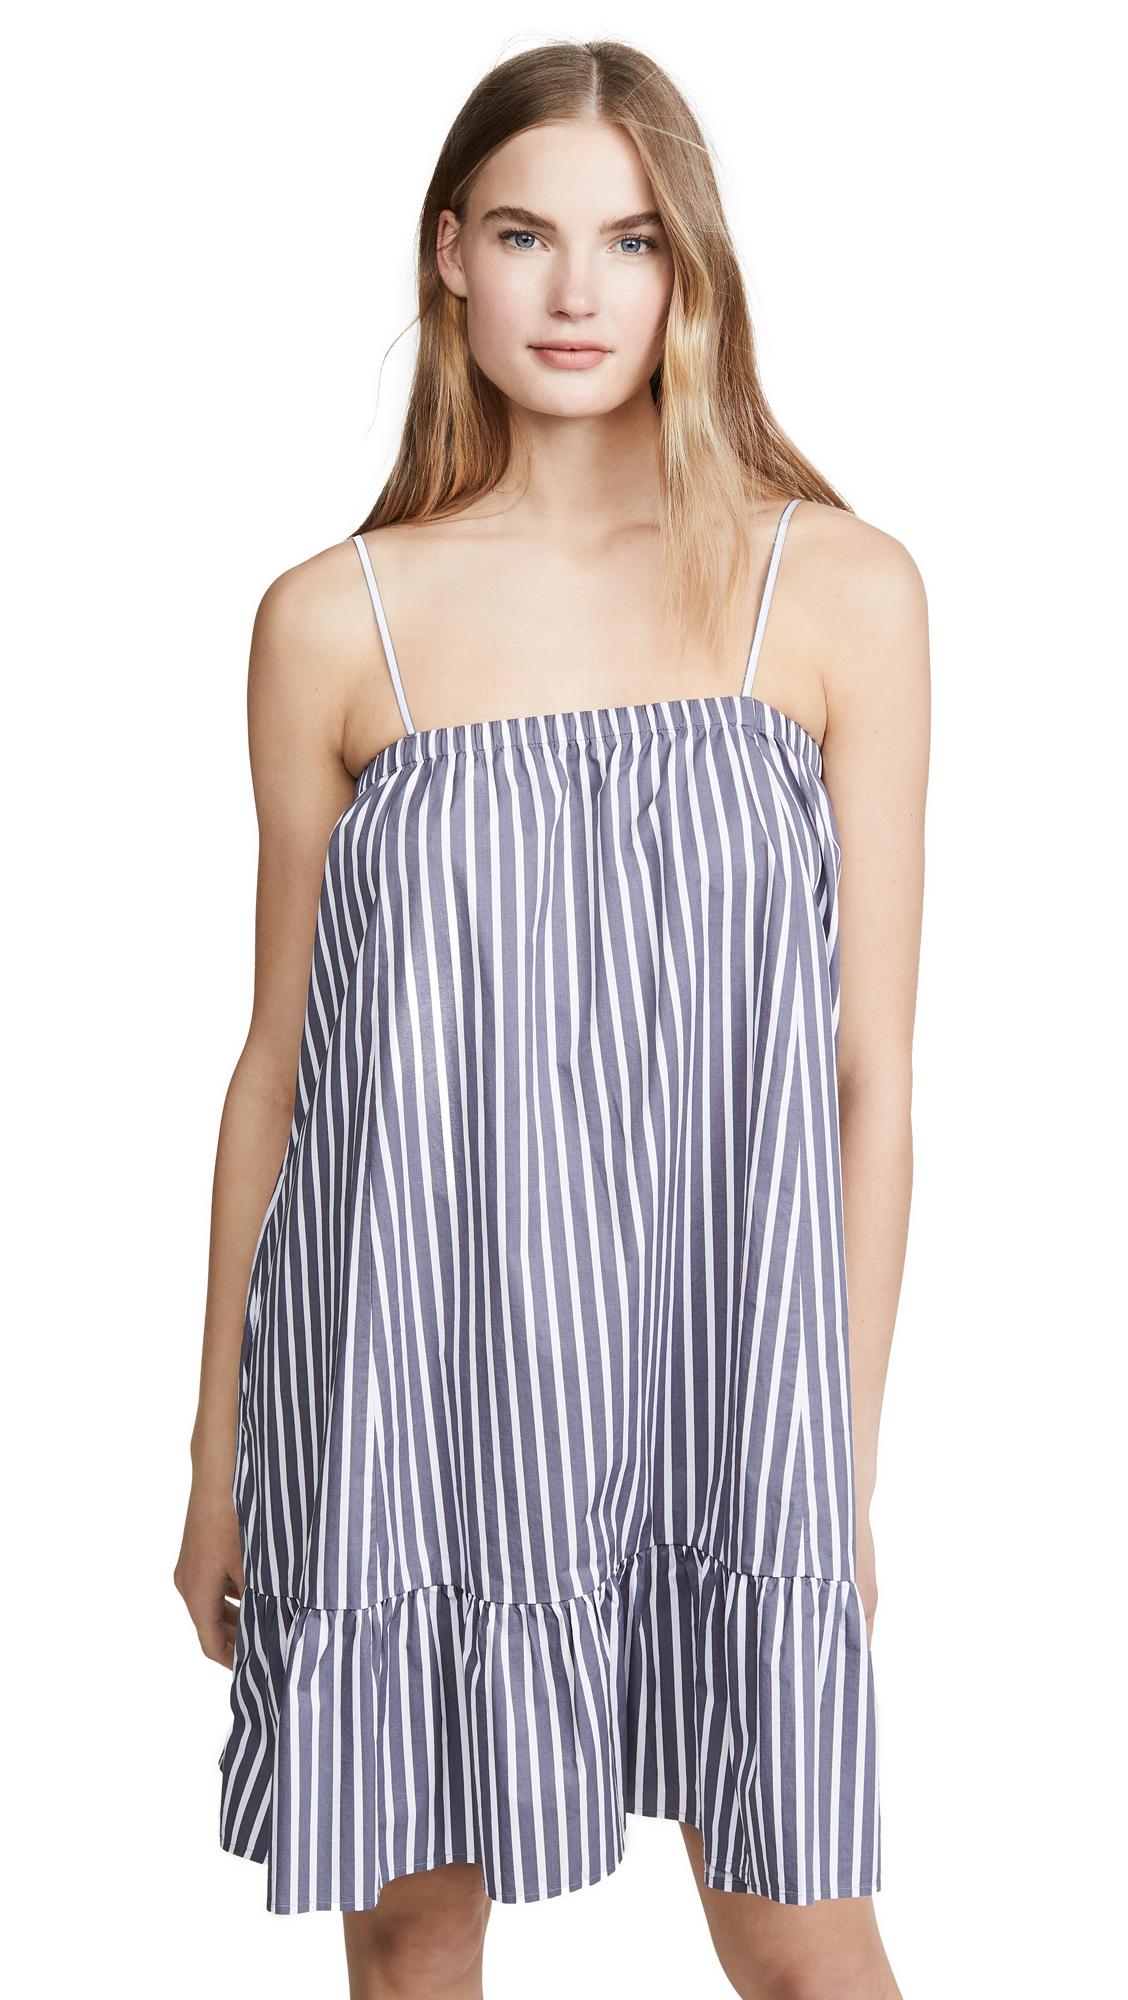 ATM Anthony Thomas Melillo Cotton Poplin Stripe Tent Dress - Marina/White Stripe